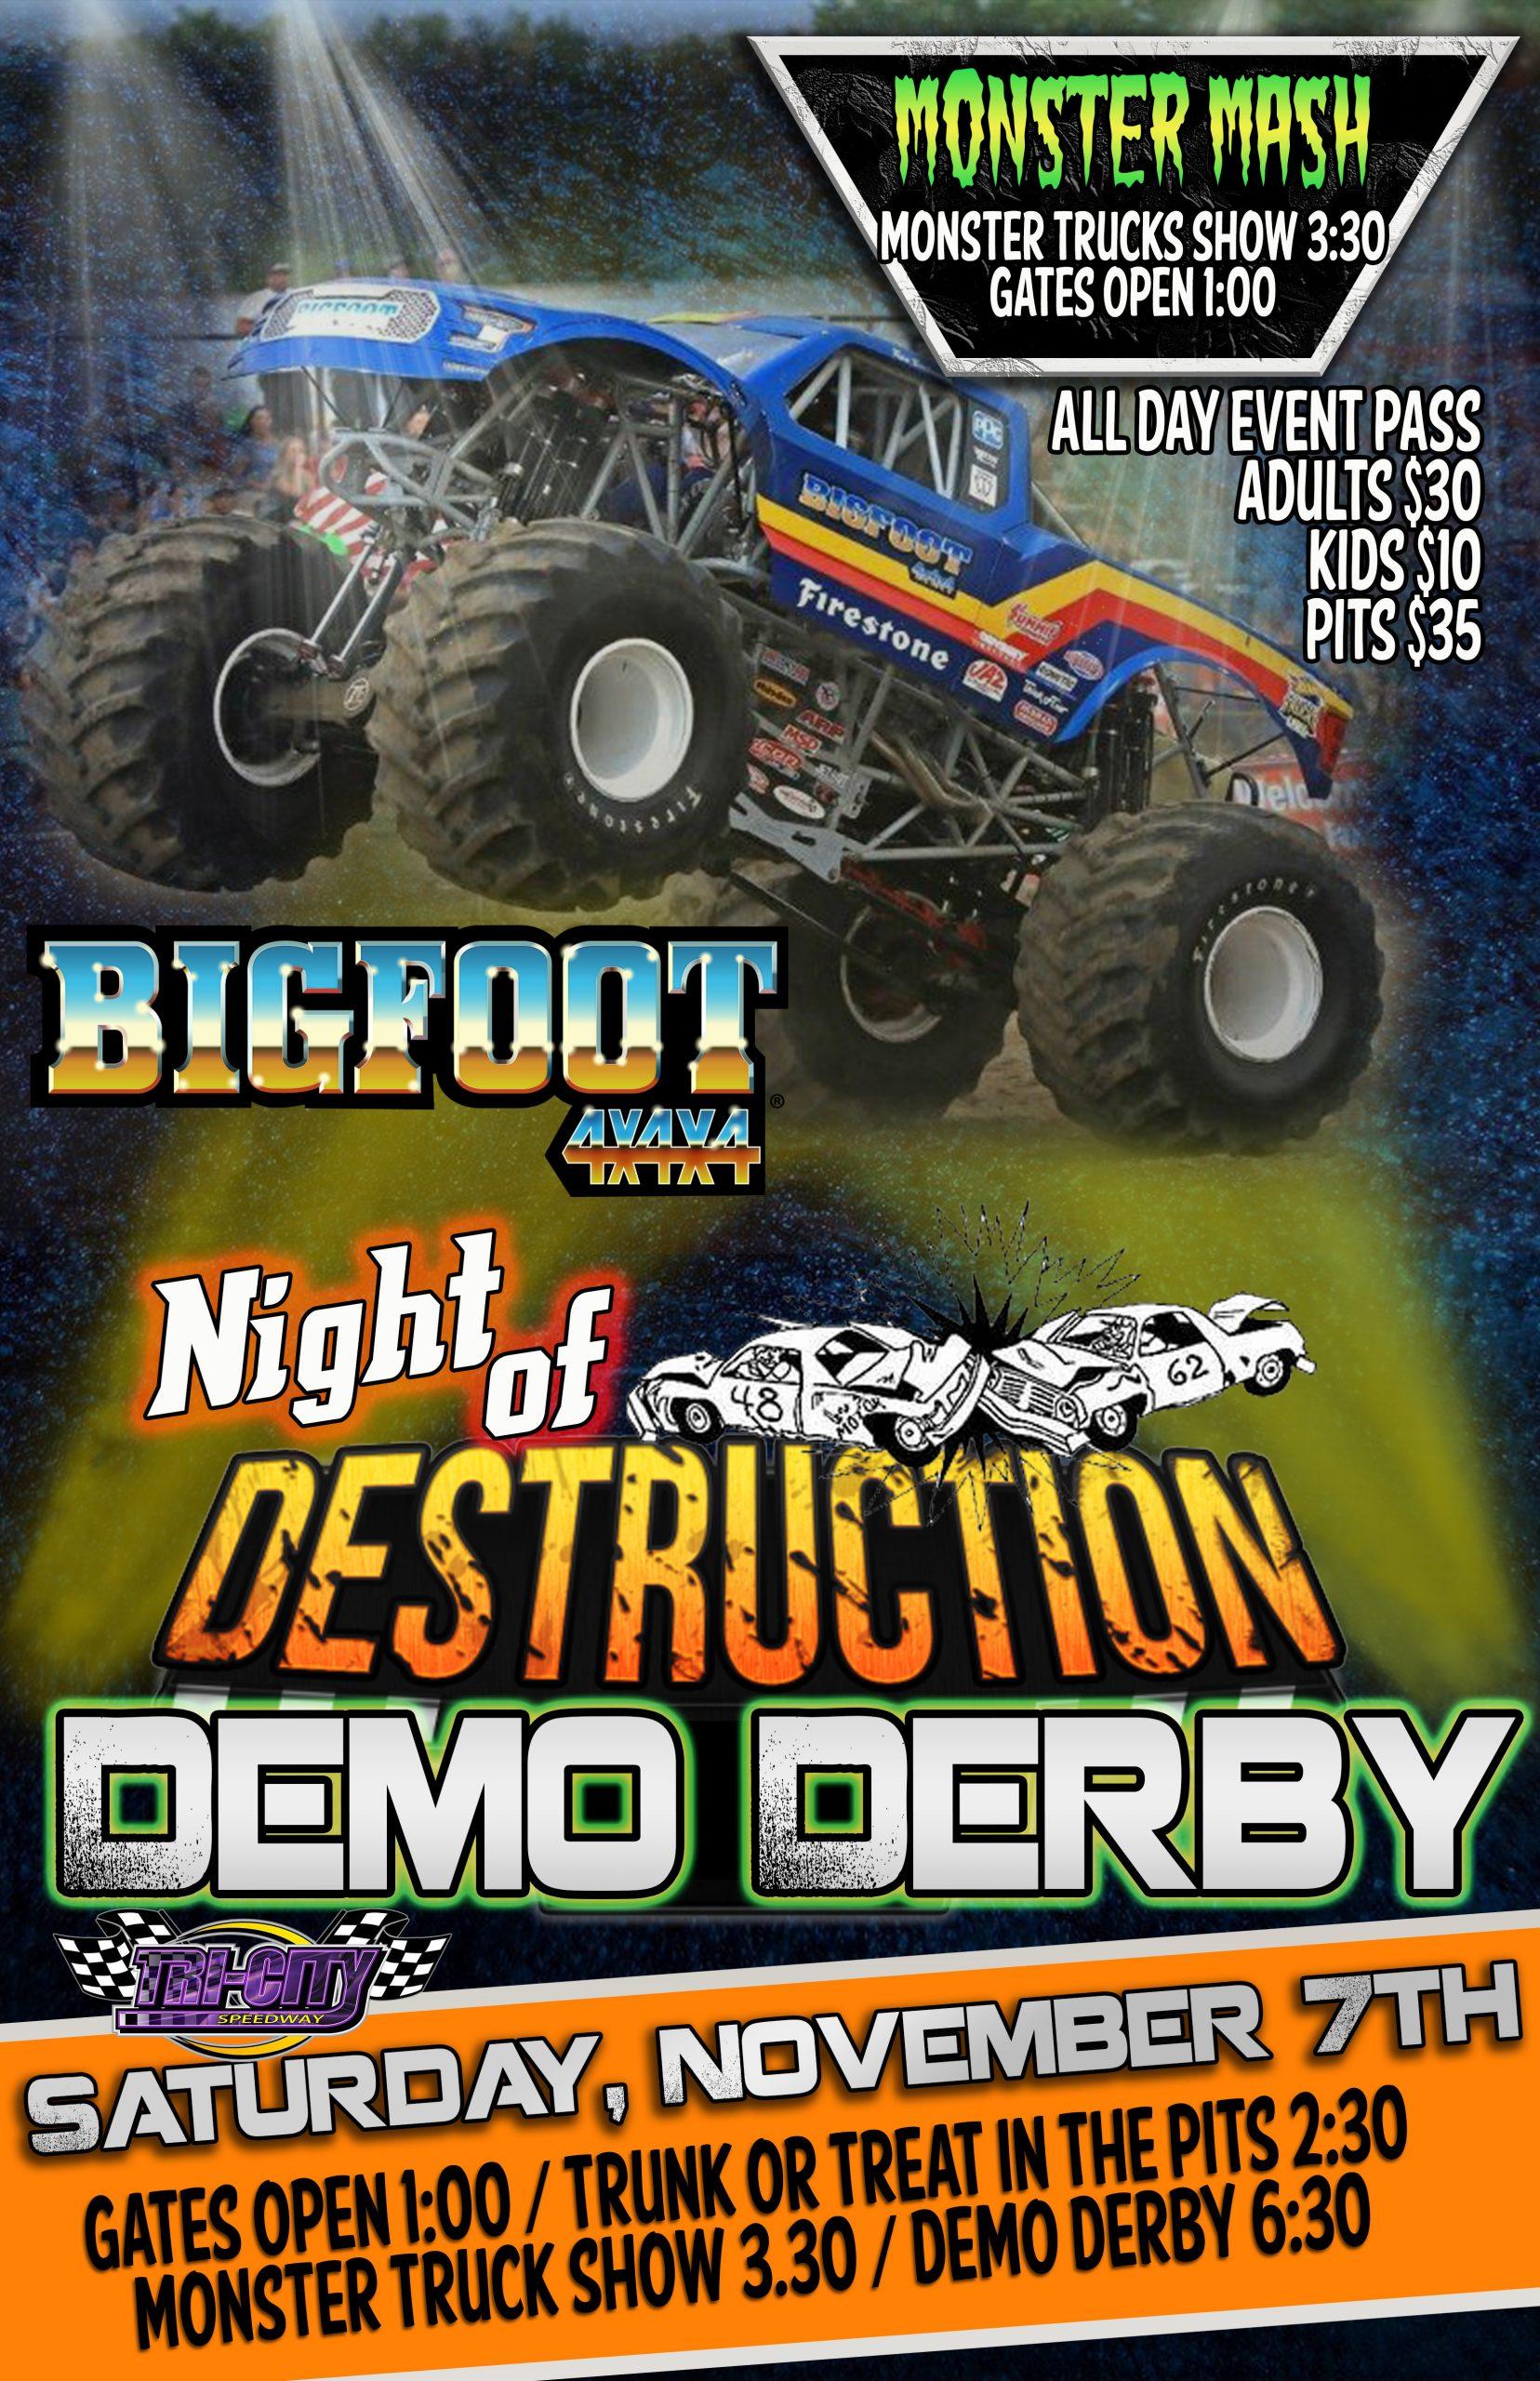 sat nov 7 big foot monster truck madness halloween monster mash with demo derby trailer races kids power wheel demo tri city speedway power wheel demo tri city speedway